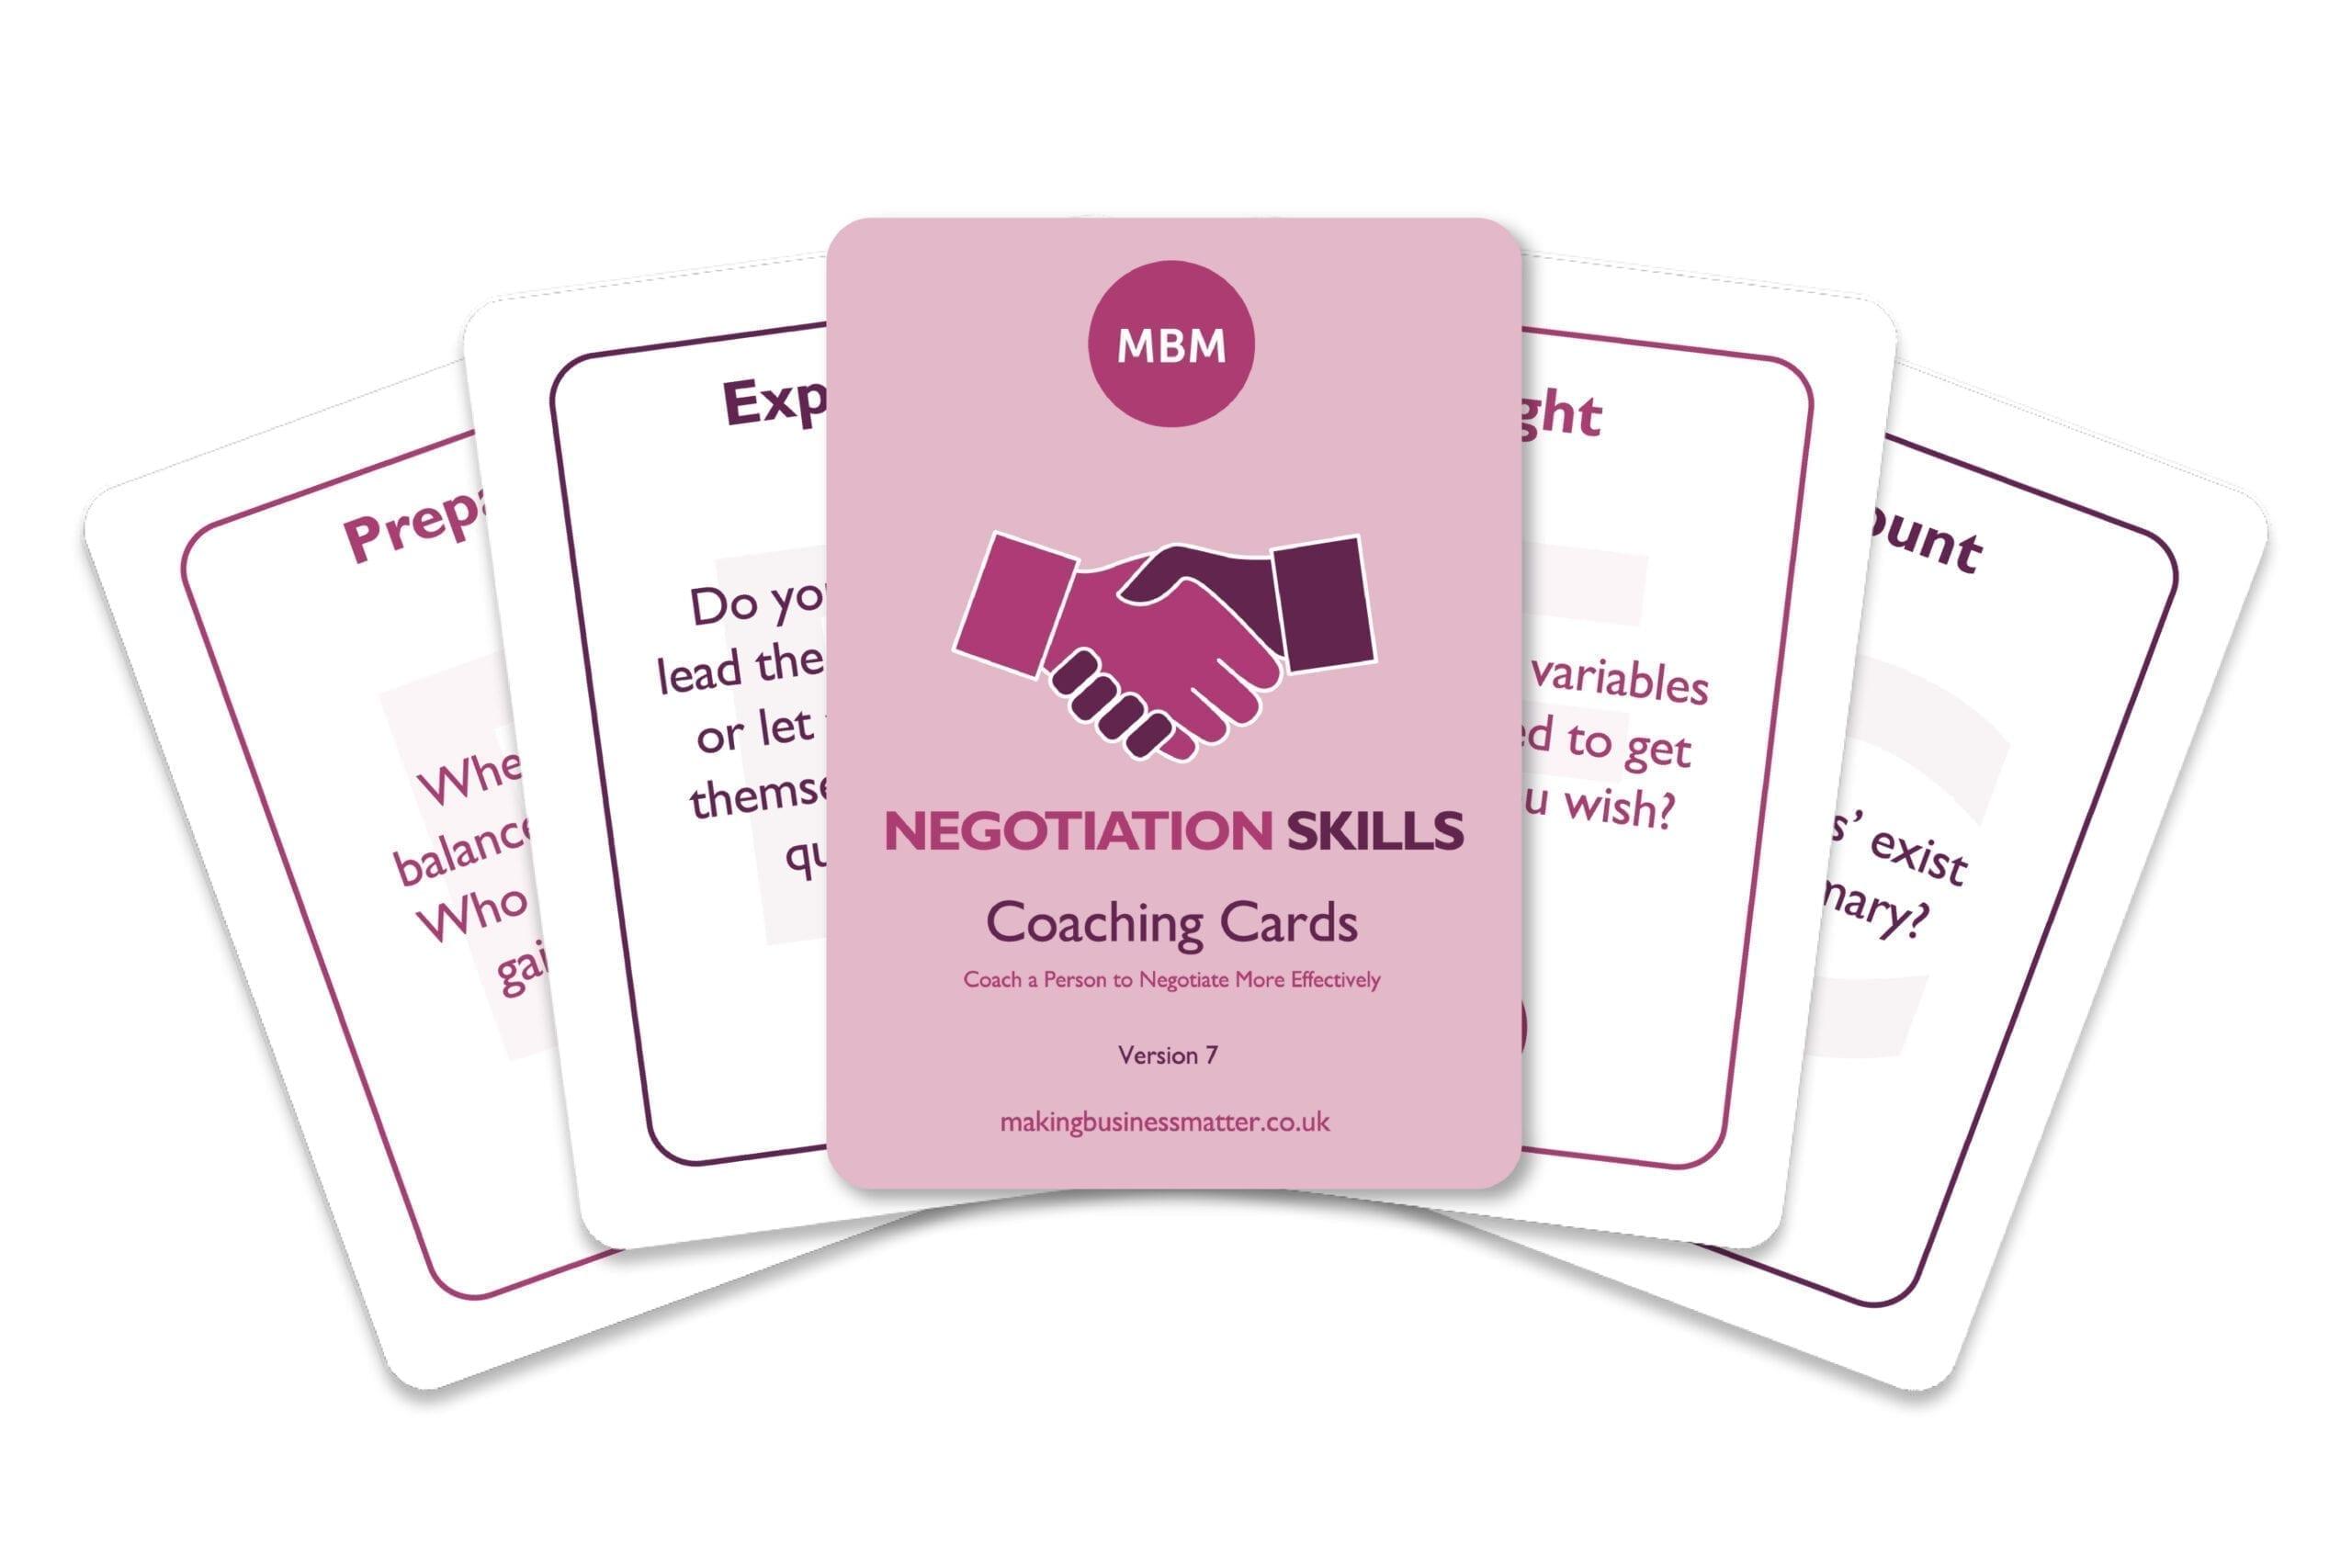 Negotiation Skills Coaching Cards